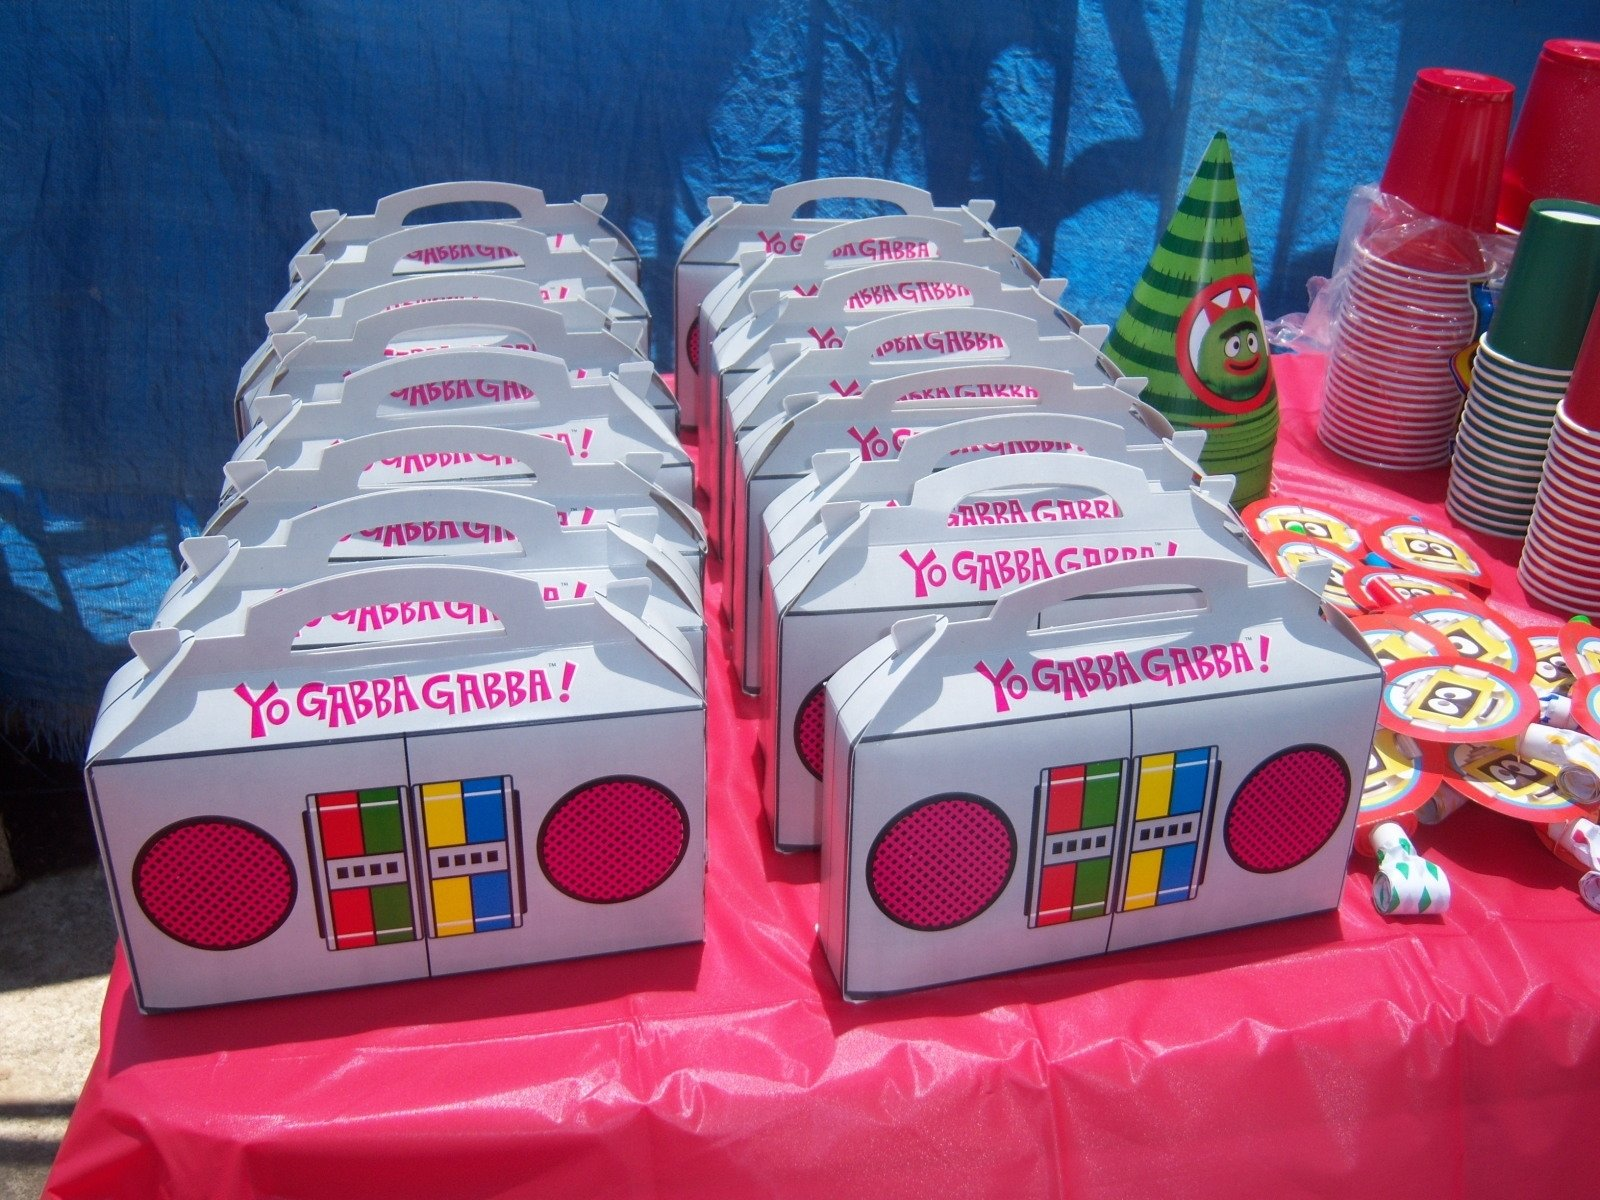 10 Great Yo Gabba Gabba Birthday Party Ideas finest yo gabba party ideas 5 25548 1 2020